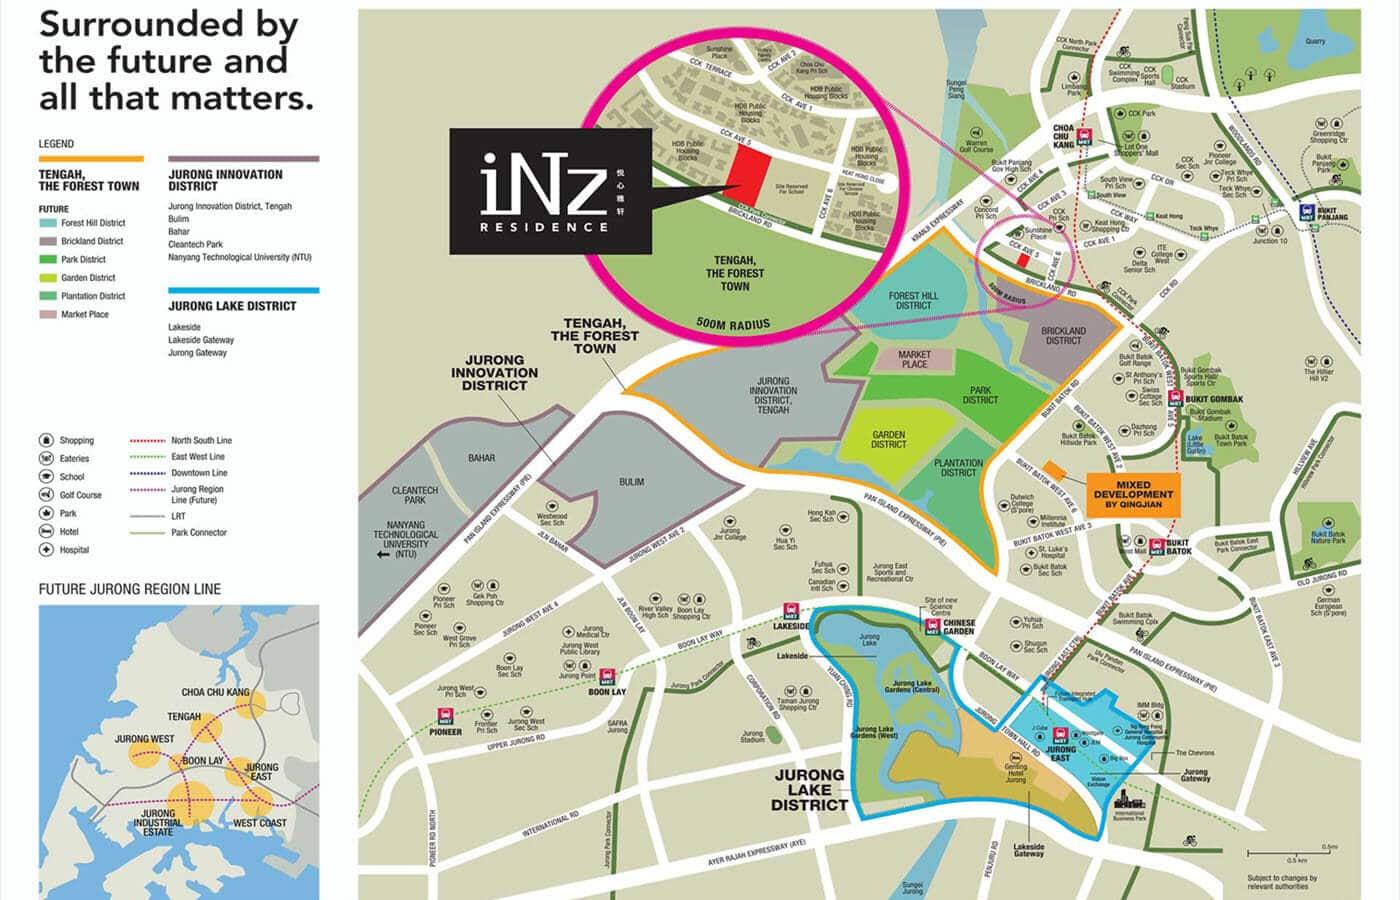 iNz Residence Executive Condo Location Map